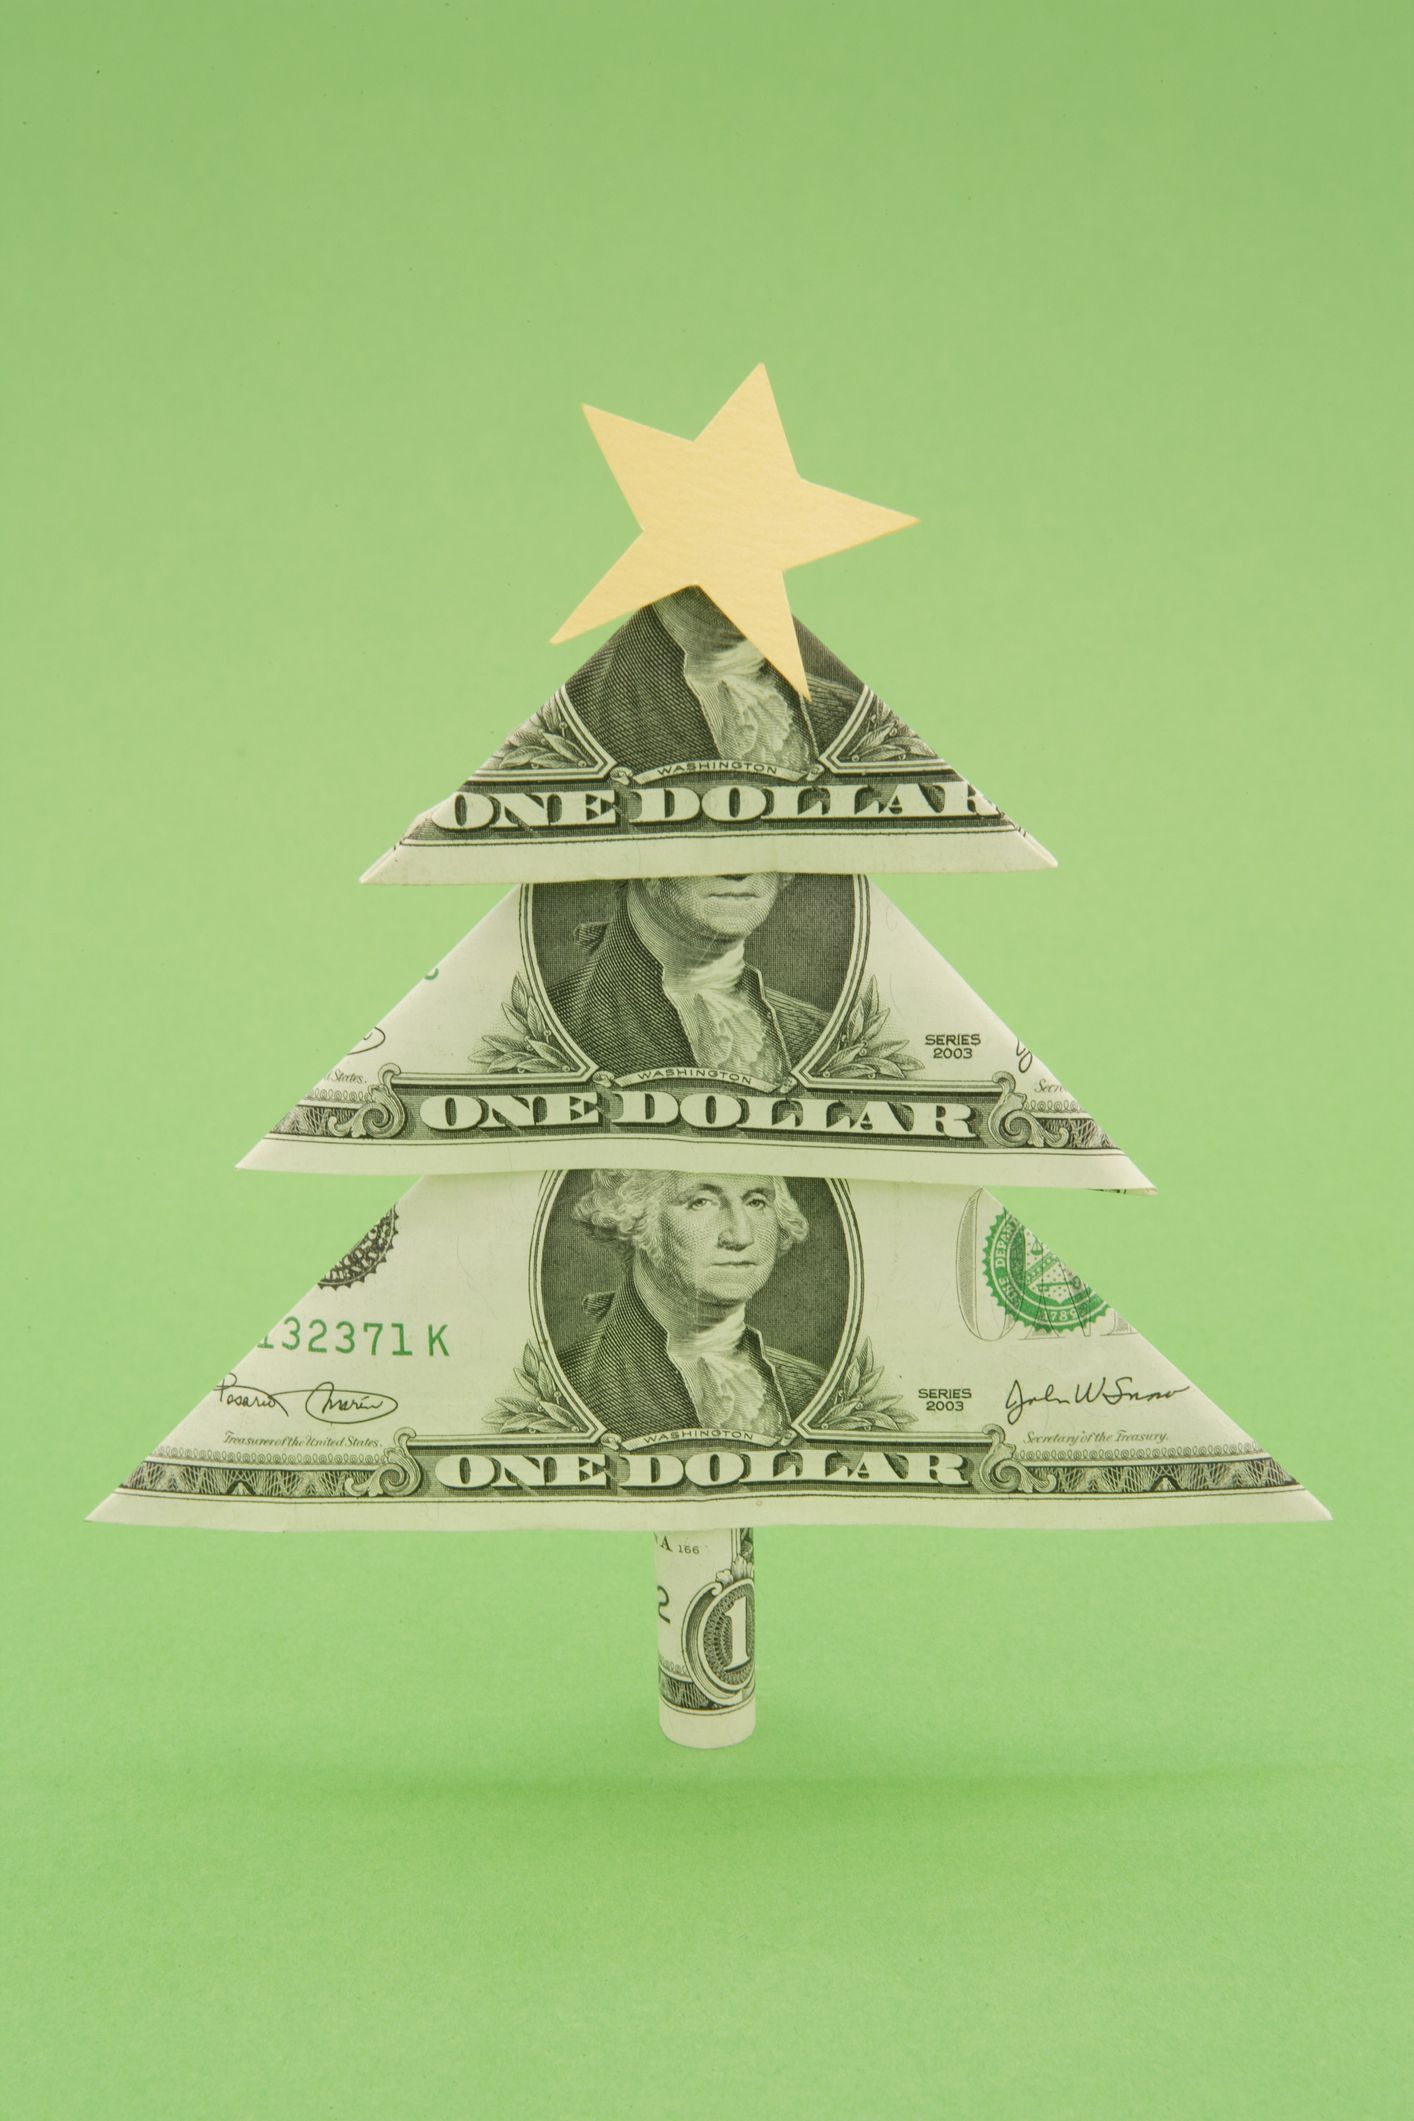 Money Tree Dollars Bills Craft Tutorial DIY Gift Decoration - YouTube | Christmas  money, Diy crafts for gifts, Money origami | 2121x1414